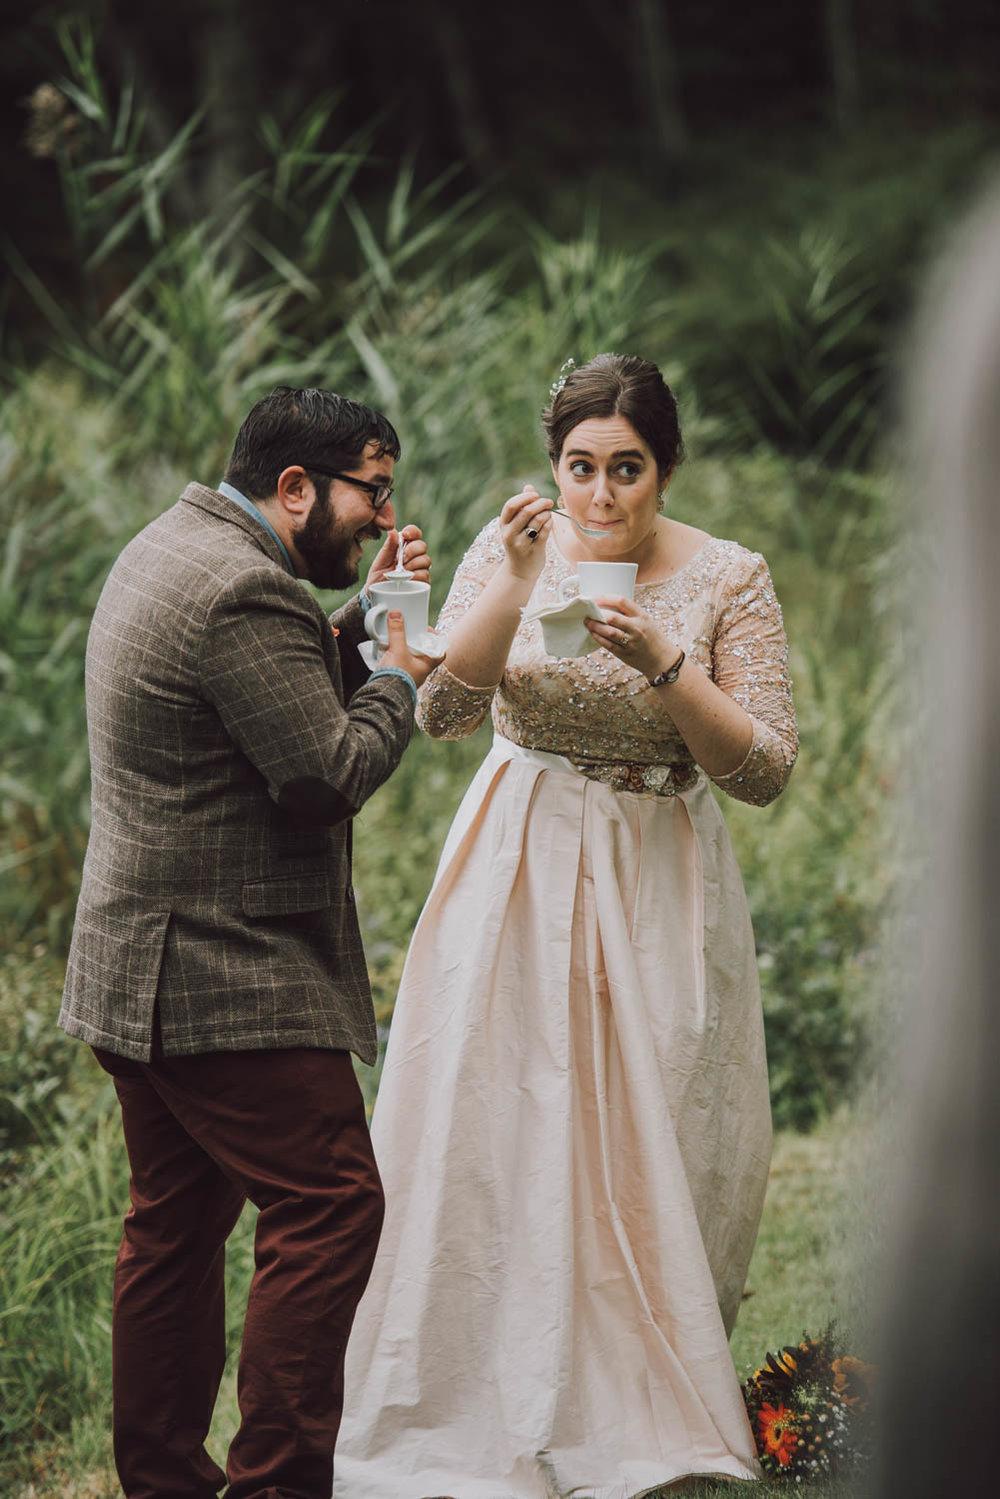 richards-wedding-photography26.jpg